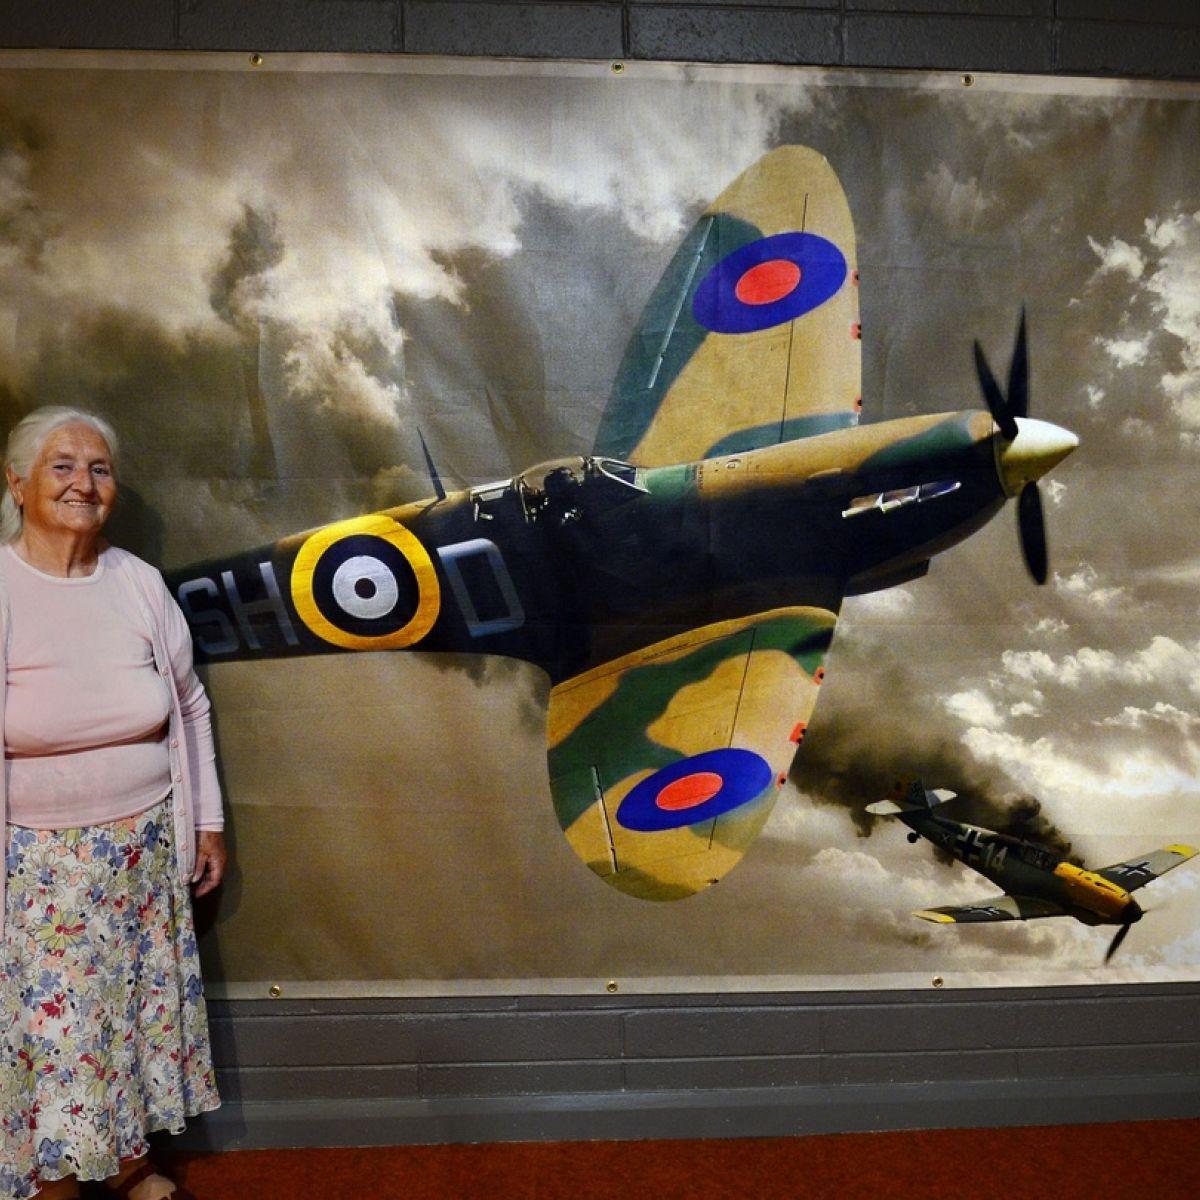 Spitfire that crash-landed in Co Monaghan put on display